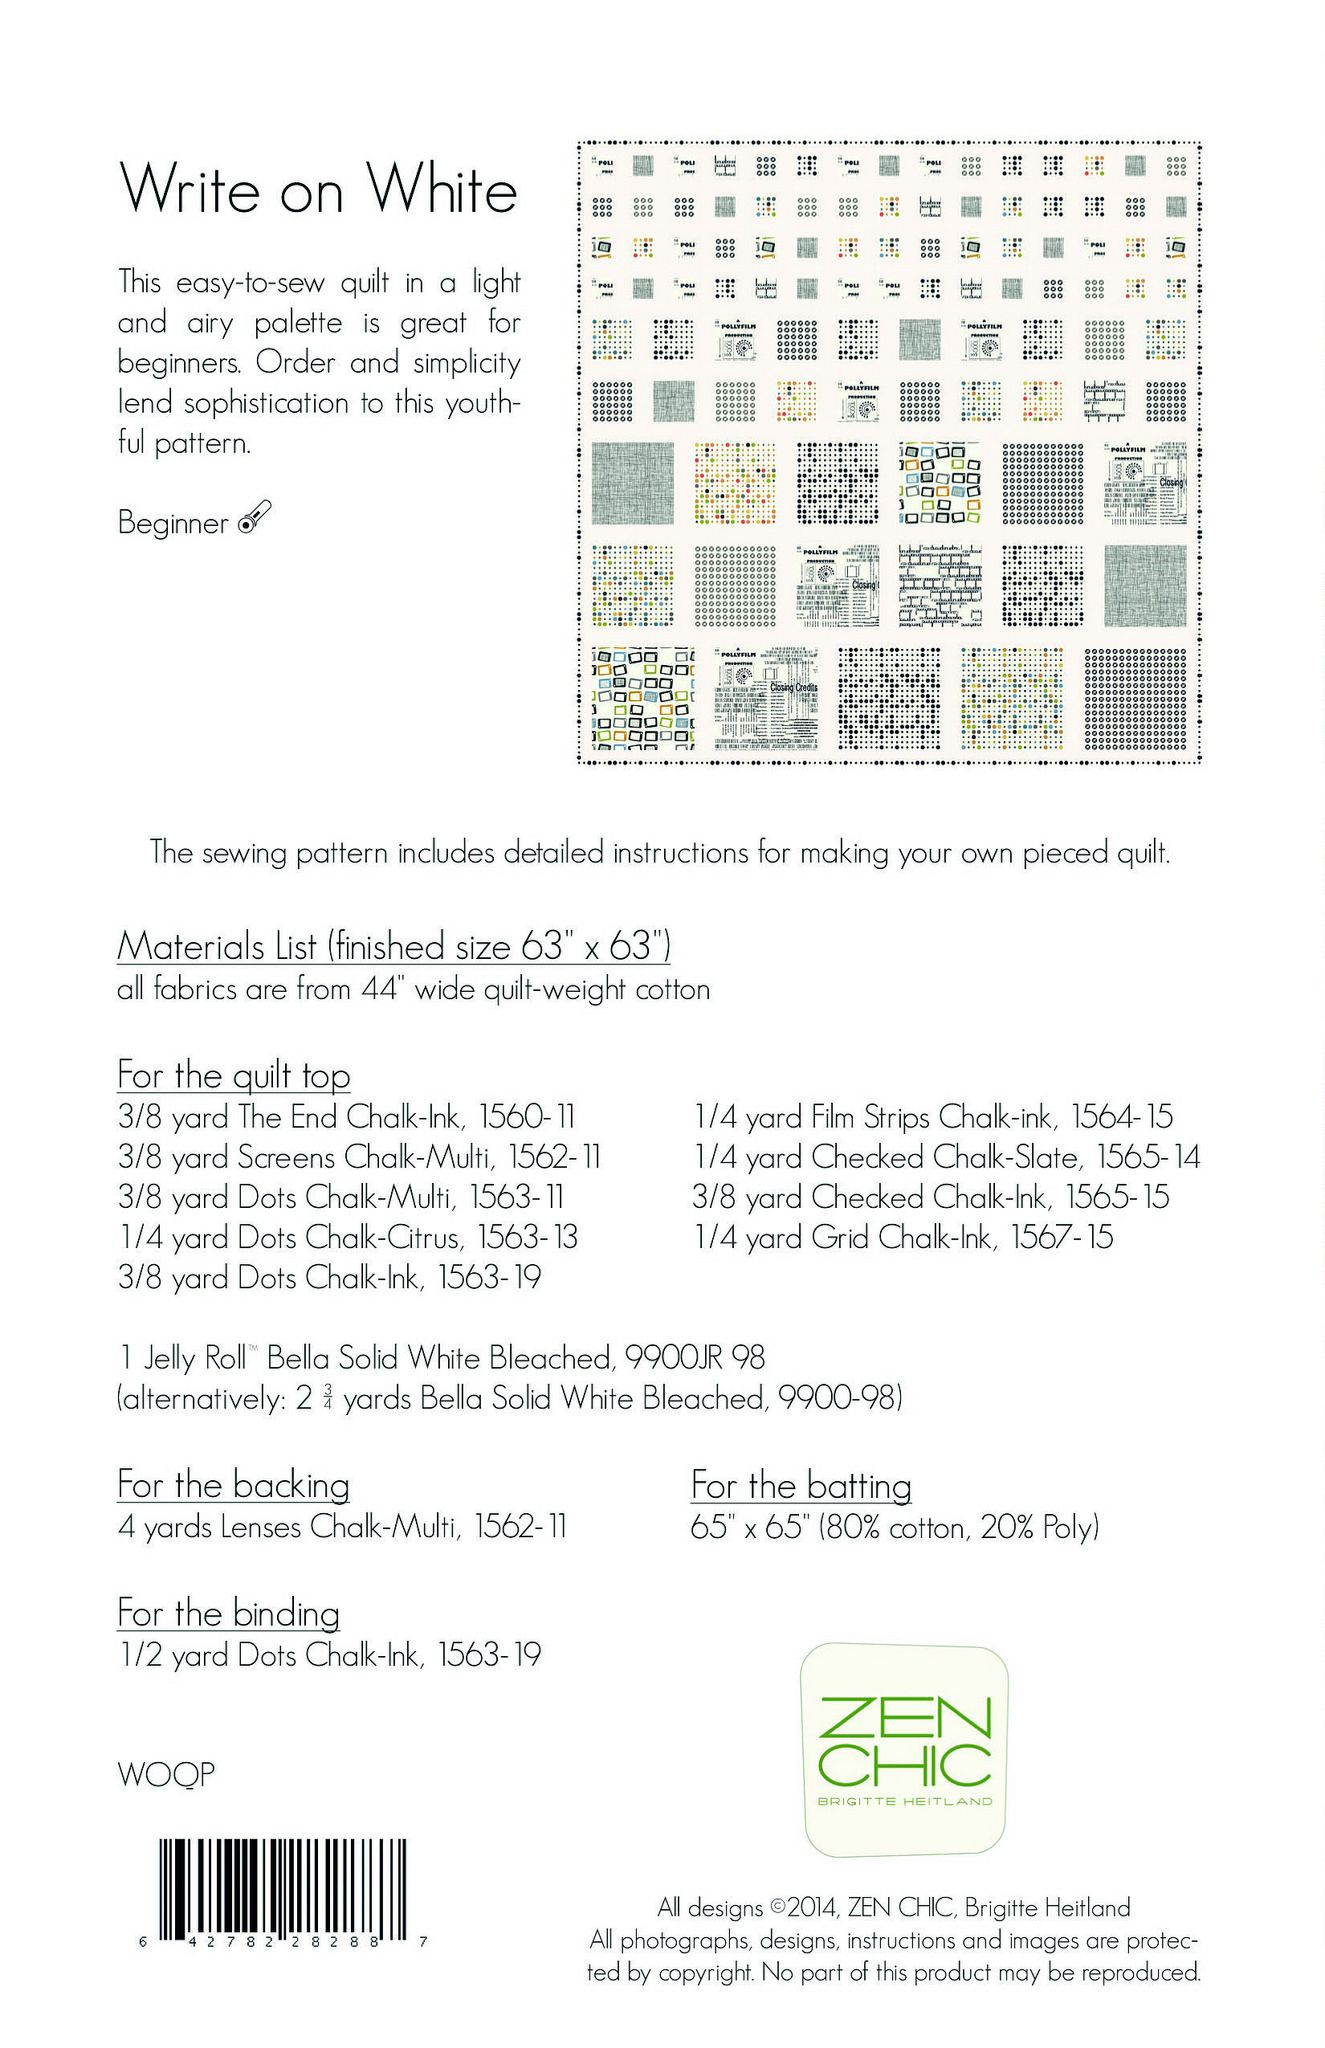 Write on White | ZEN CHIC Patterns | Chic quilts, Chic ...